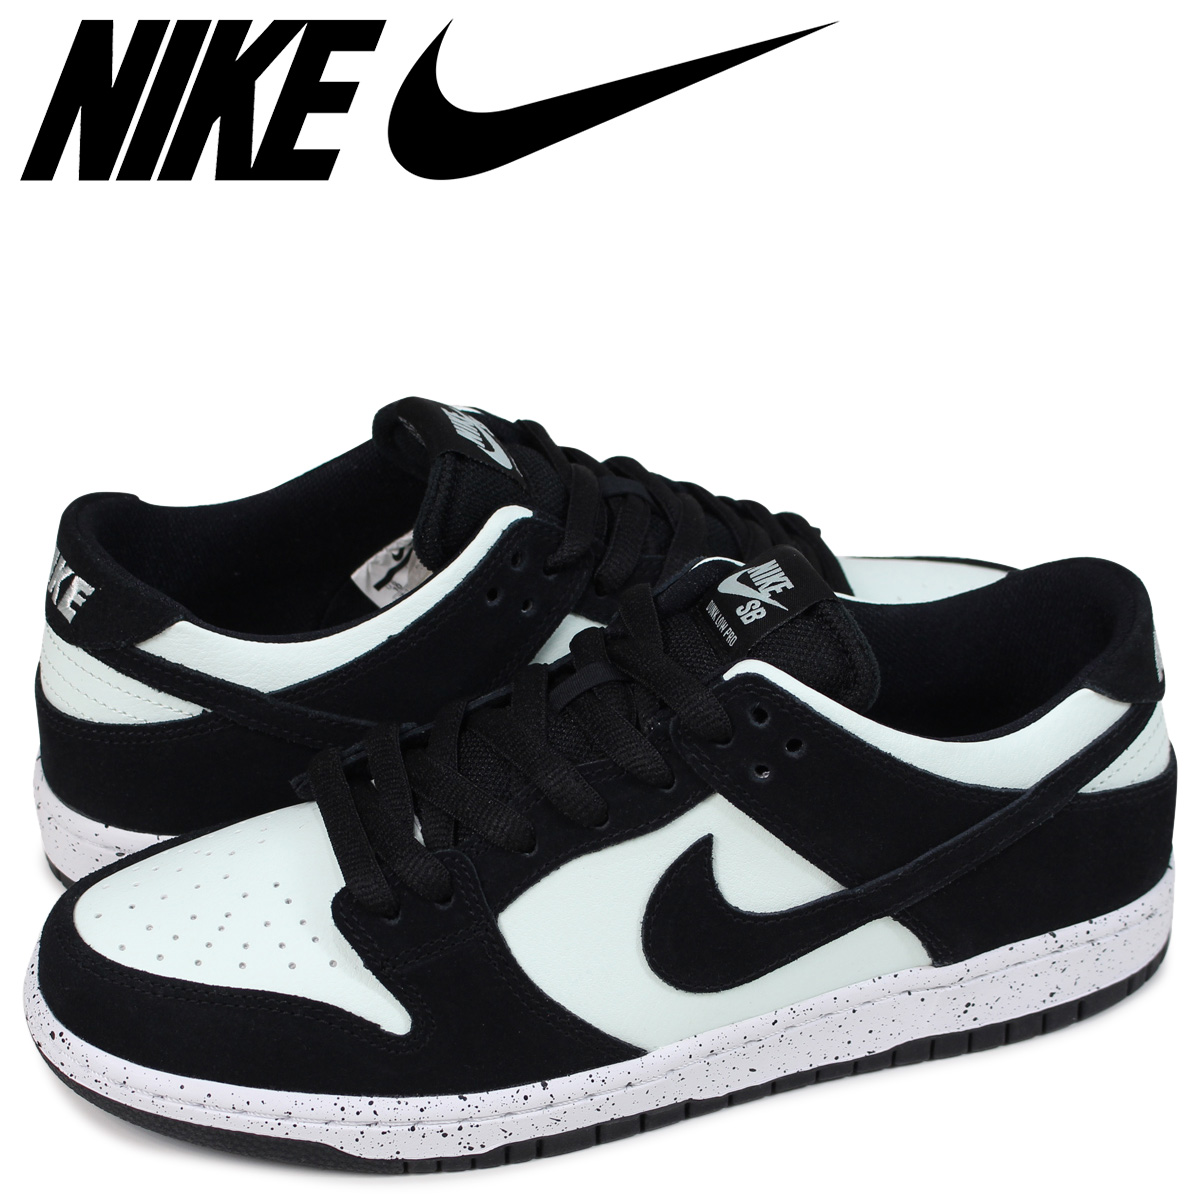 381903009f63 ... australia nike zoom dunk low pro nike sb dunk sneakers men 854866 003  green 185 f1034